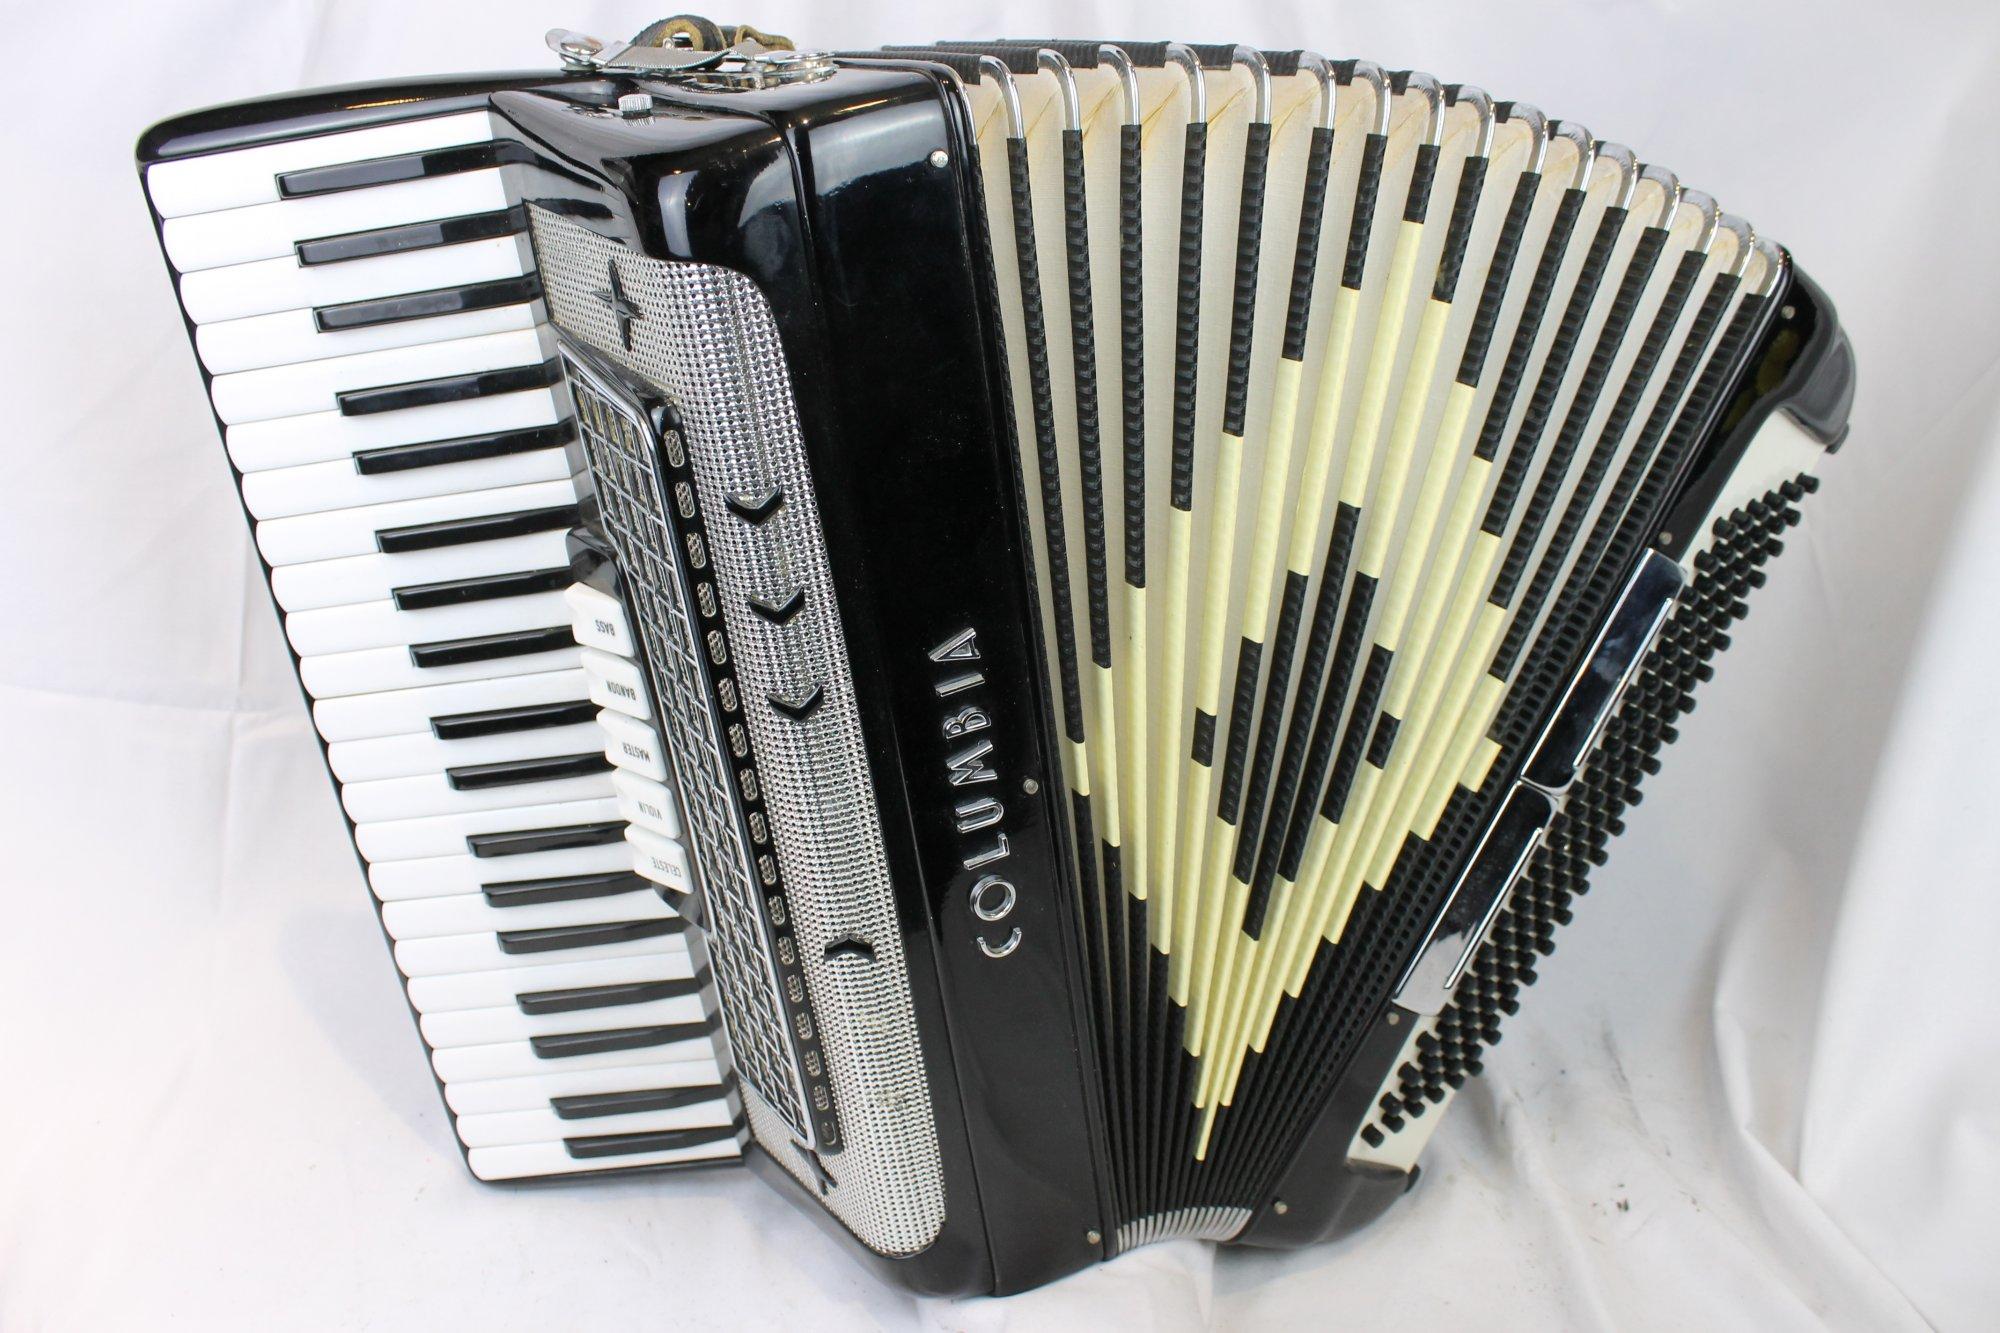 3772 - Black Columbia Piano Accordion LMM 41 120